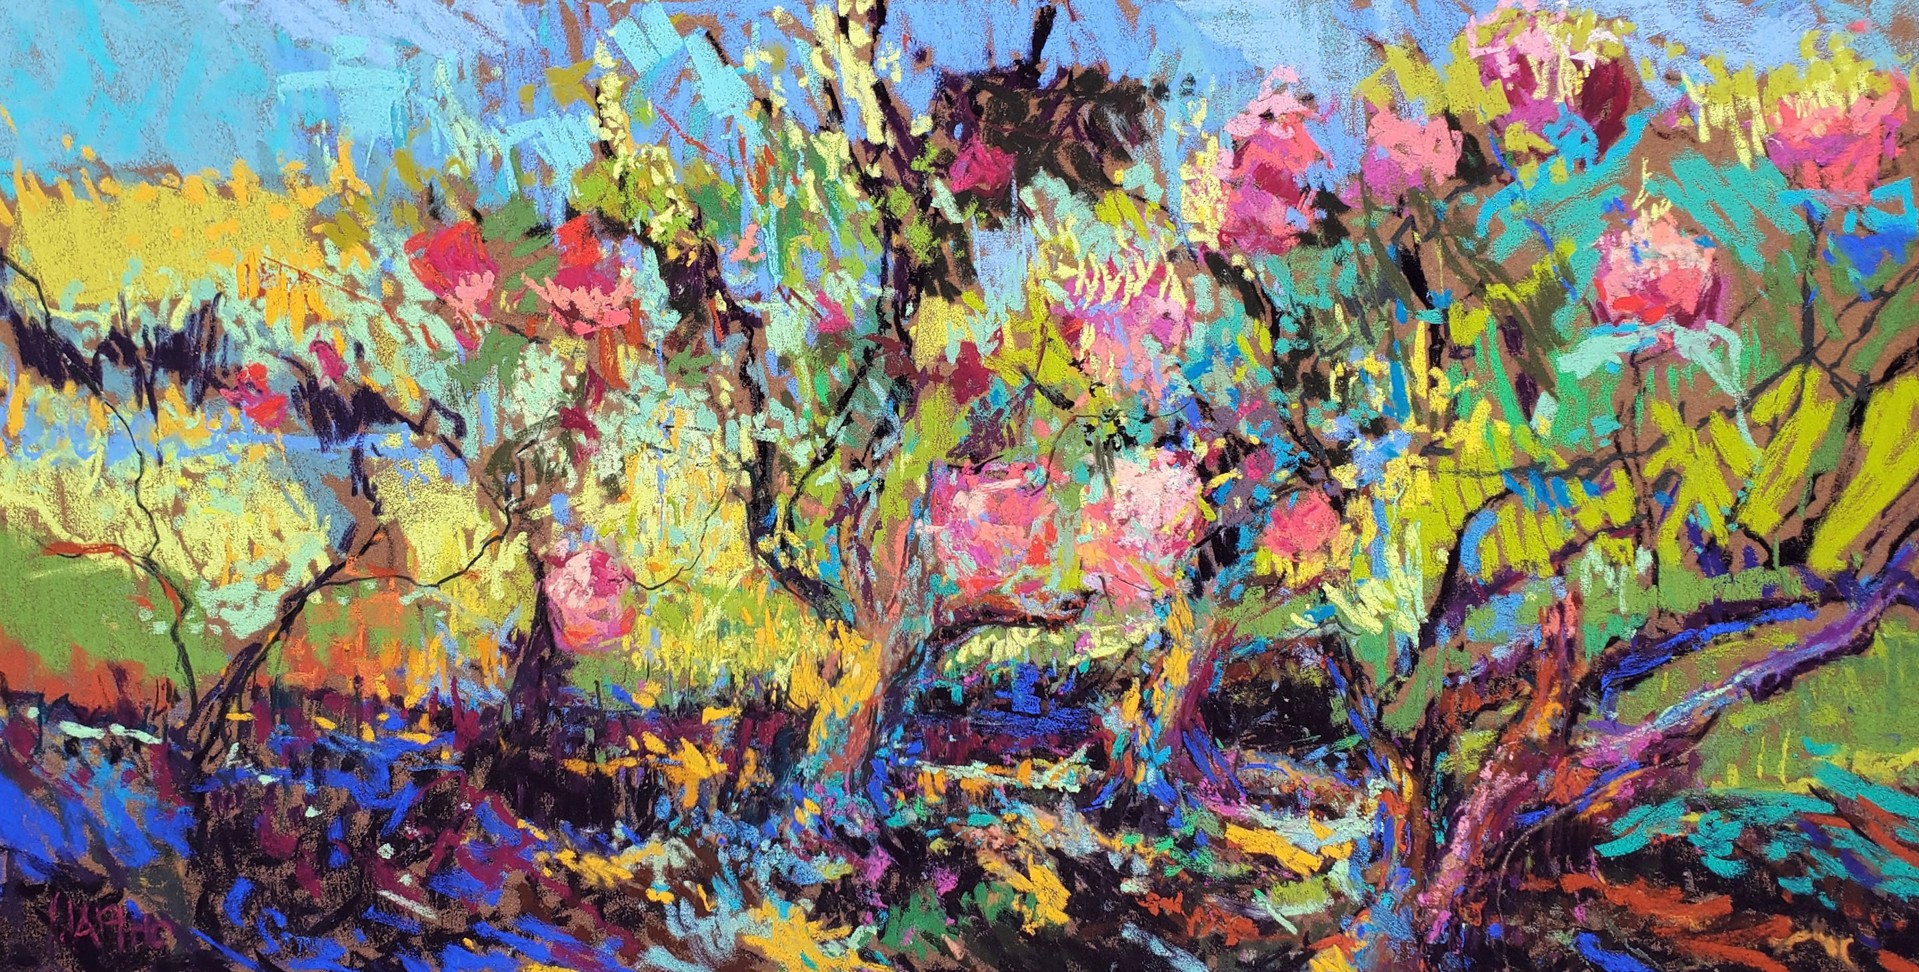 Rhodos in the Garden by Maria Marino